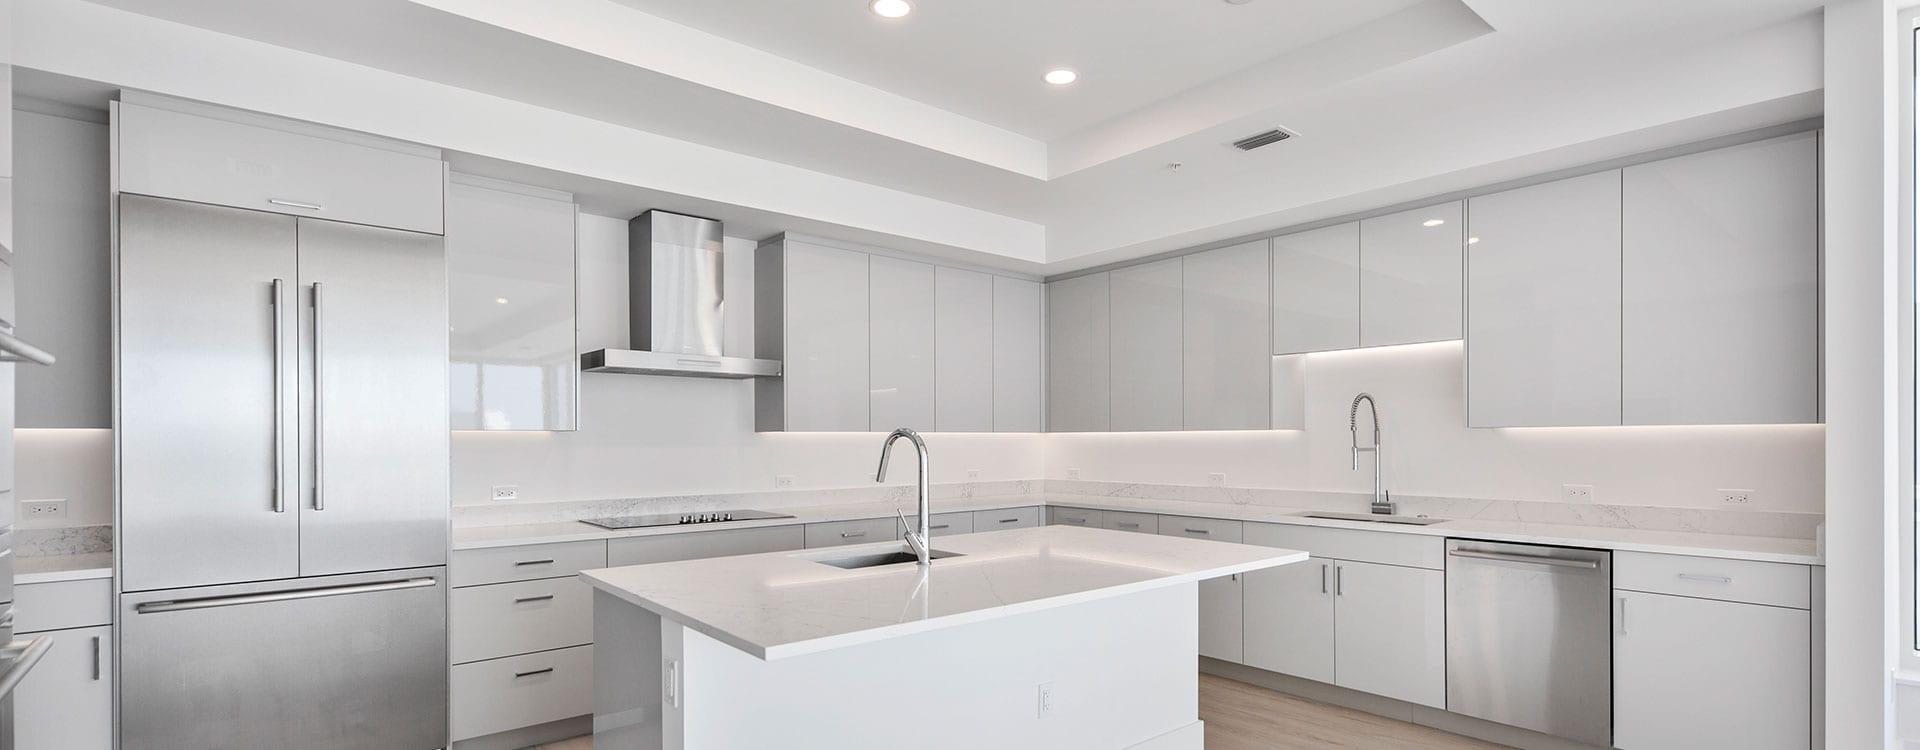 BLVD Residence 1204 Kitchen